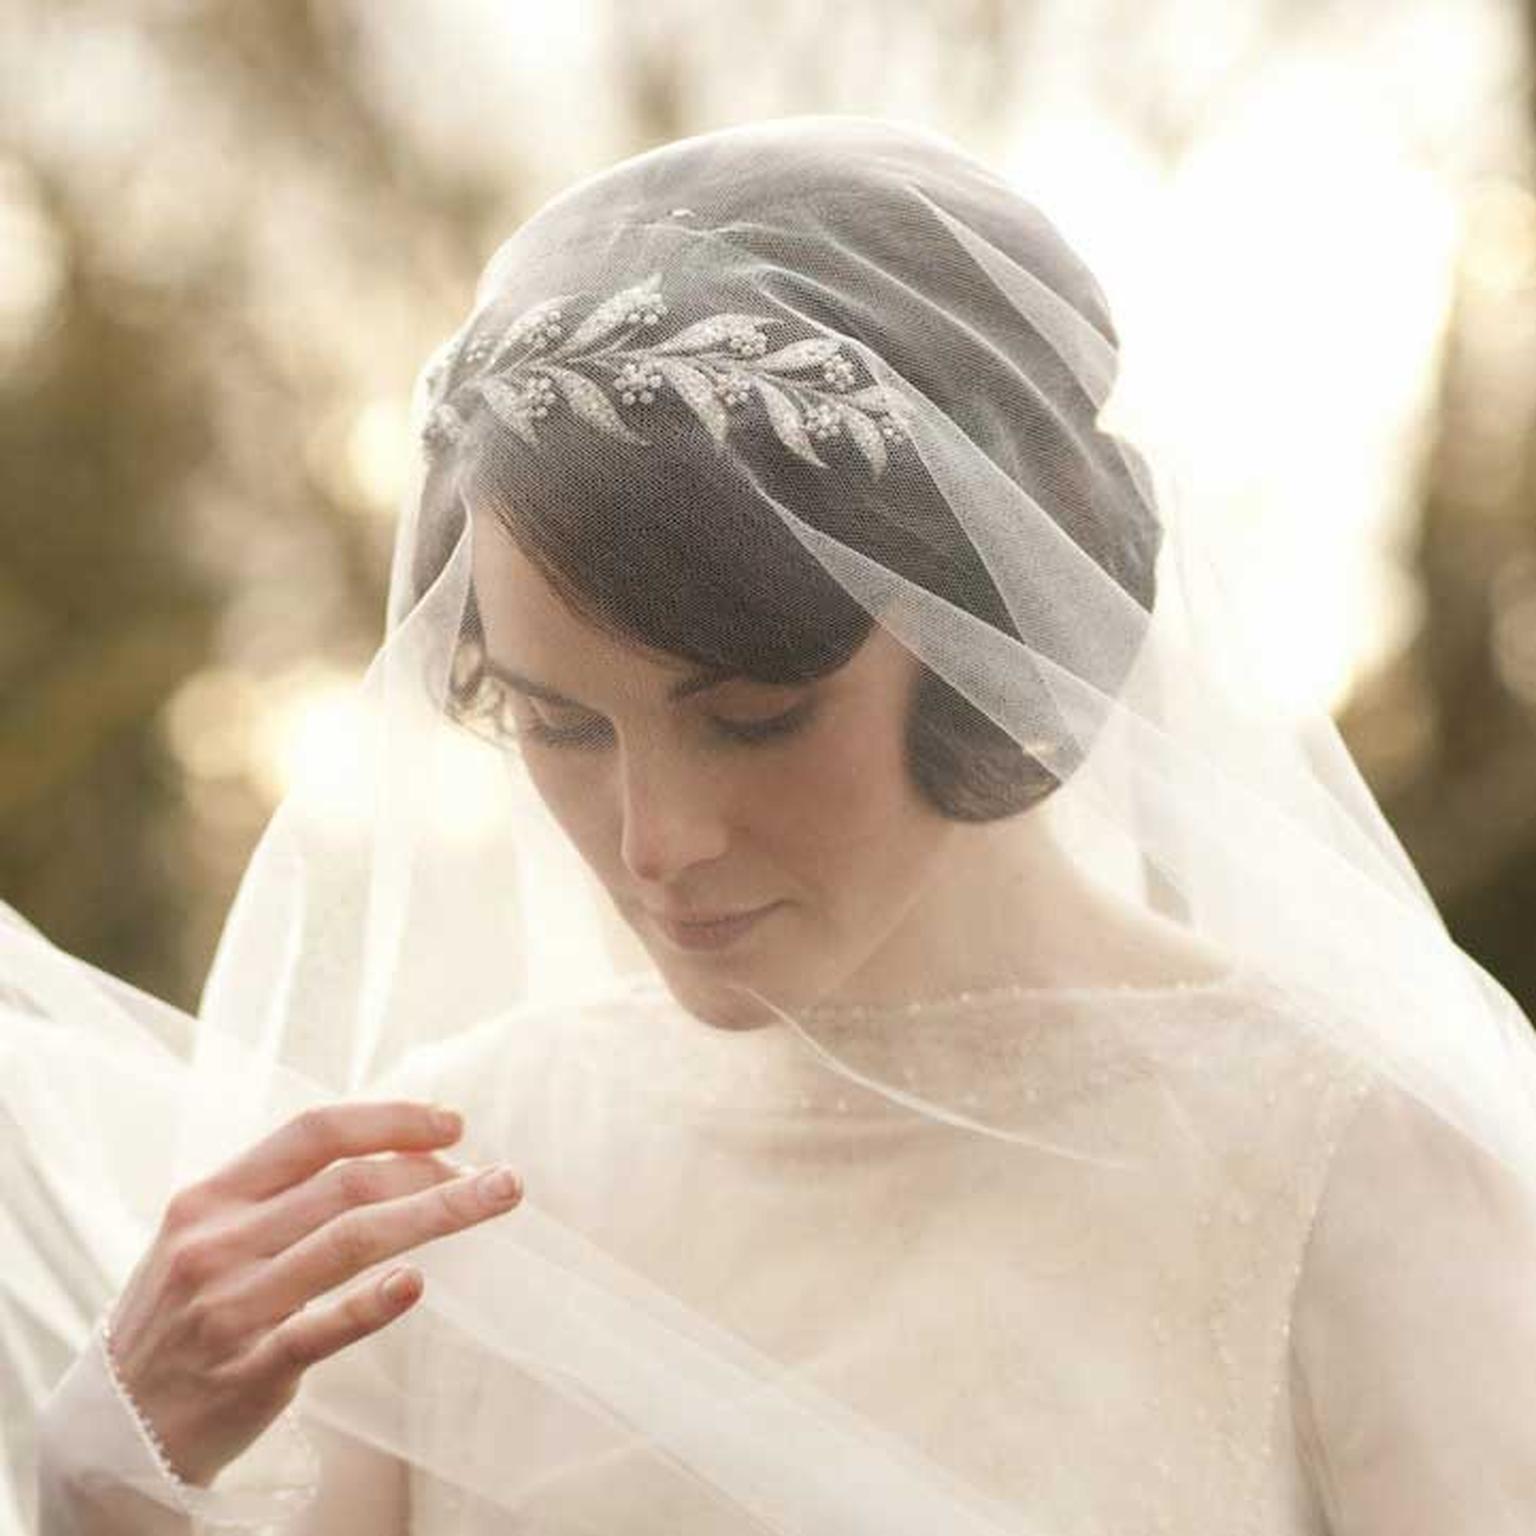 Mary Crawley Bridal Tiara In Downton Abbey